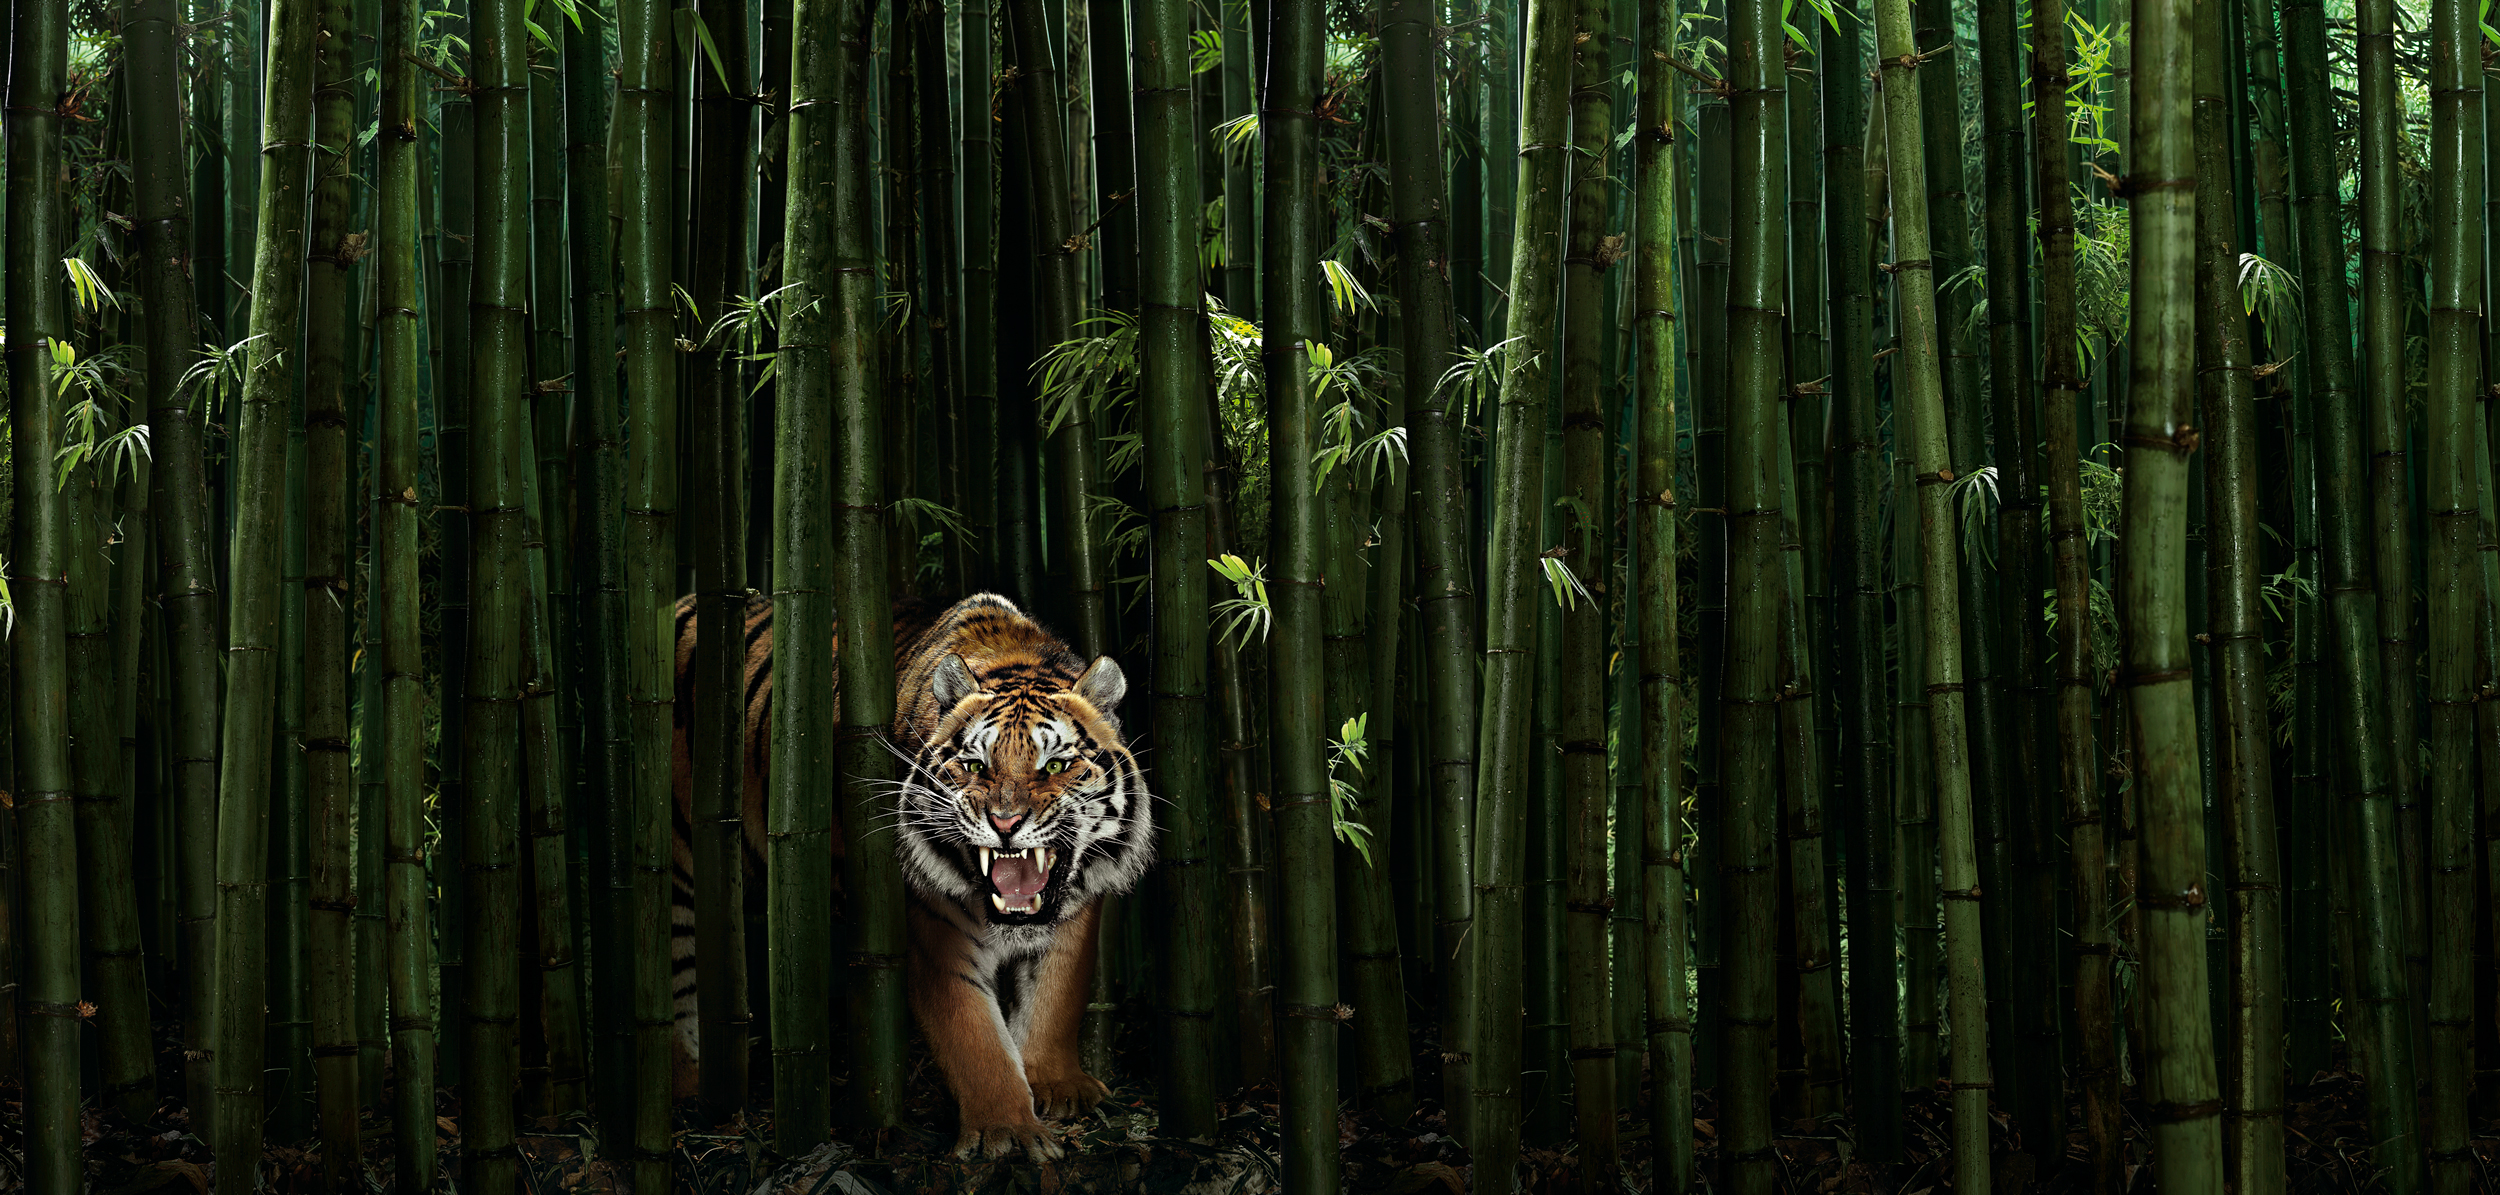 Tierfotograf Zürich Schweiz - Peter Hebeisen Editiorial Pet Tiger #12